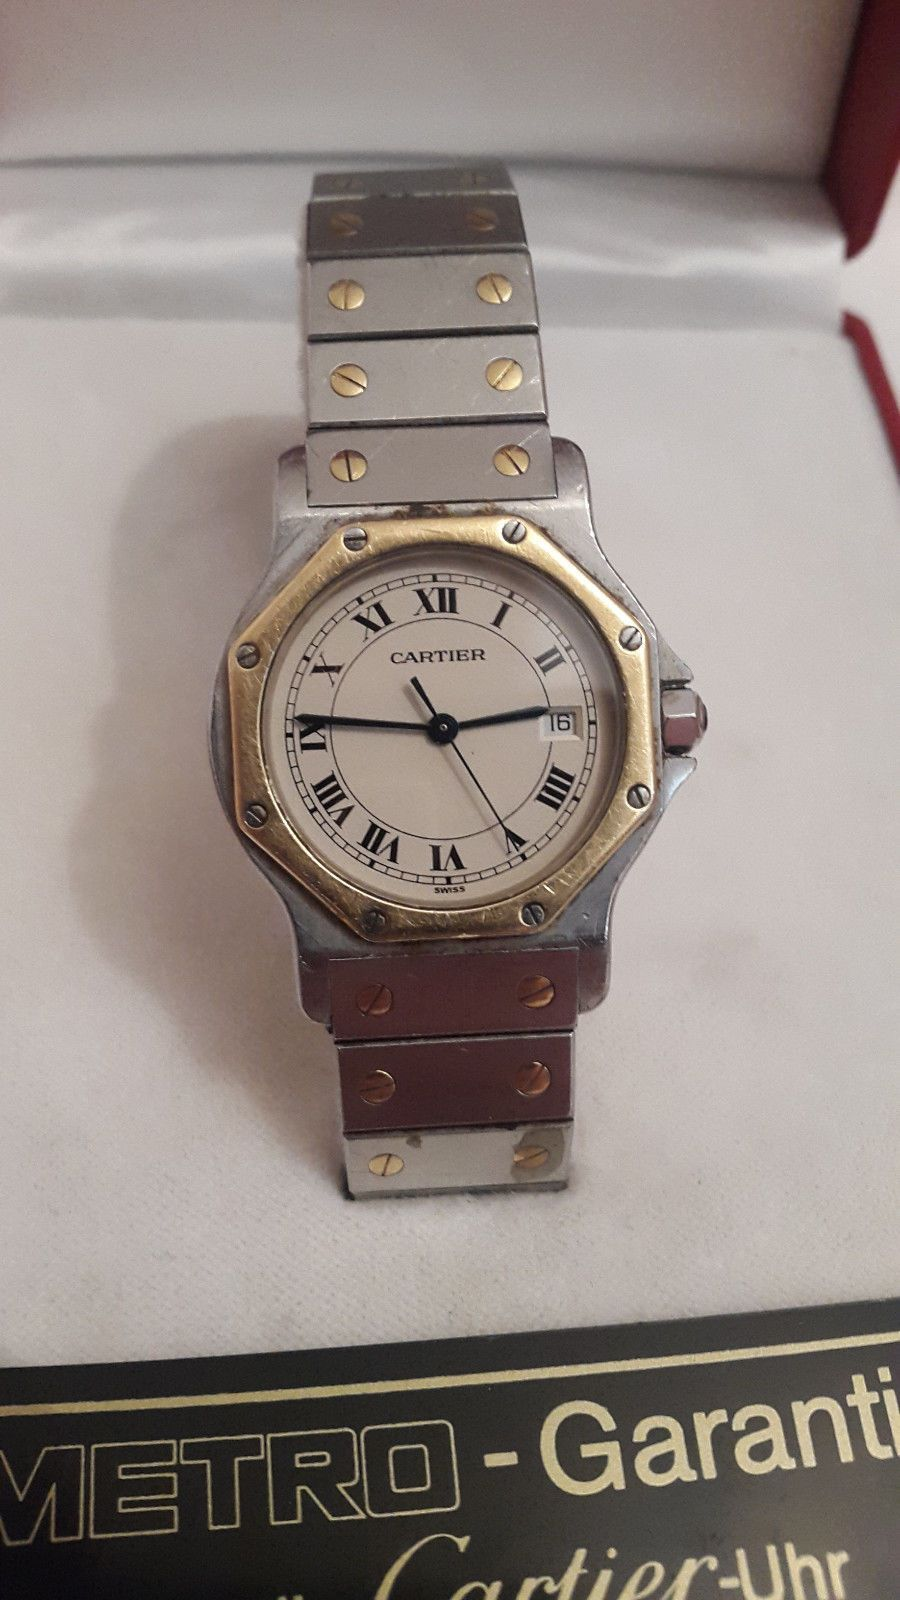 25f696fcab3 Ebay Herrenuhren Cartier Montres Santos de Cartier Armbanduhr für Herren   EUR 450